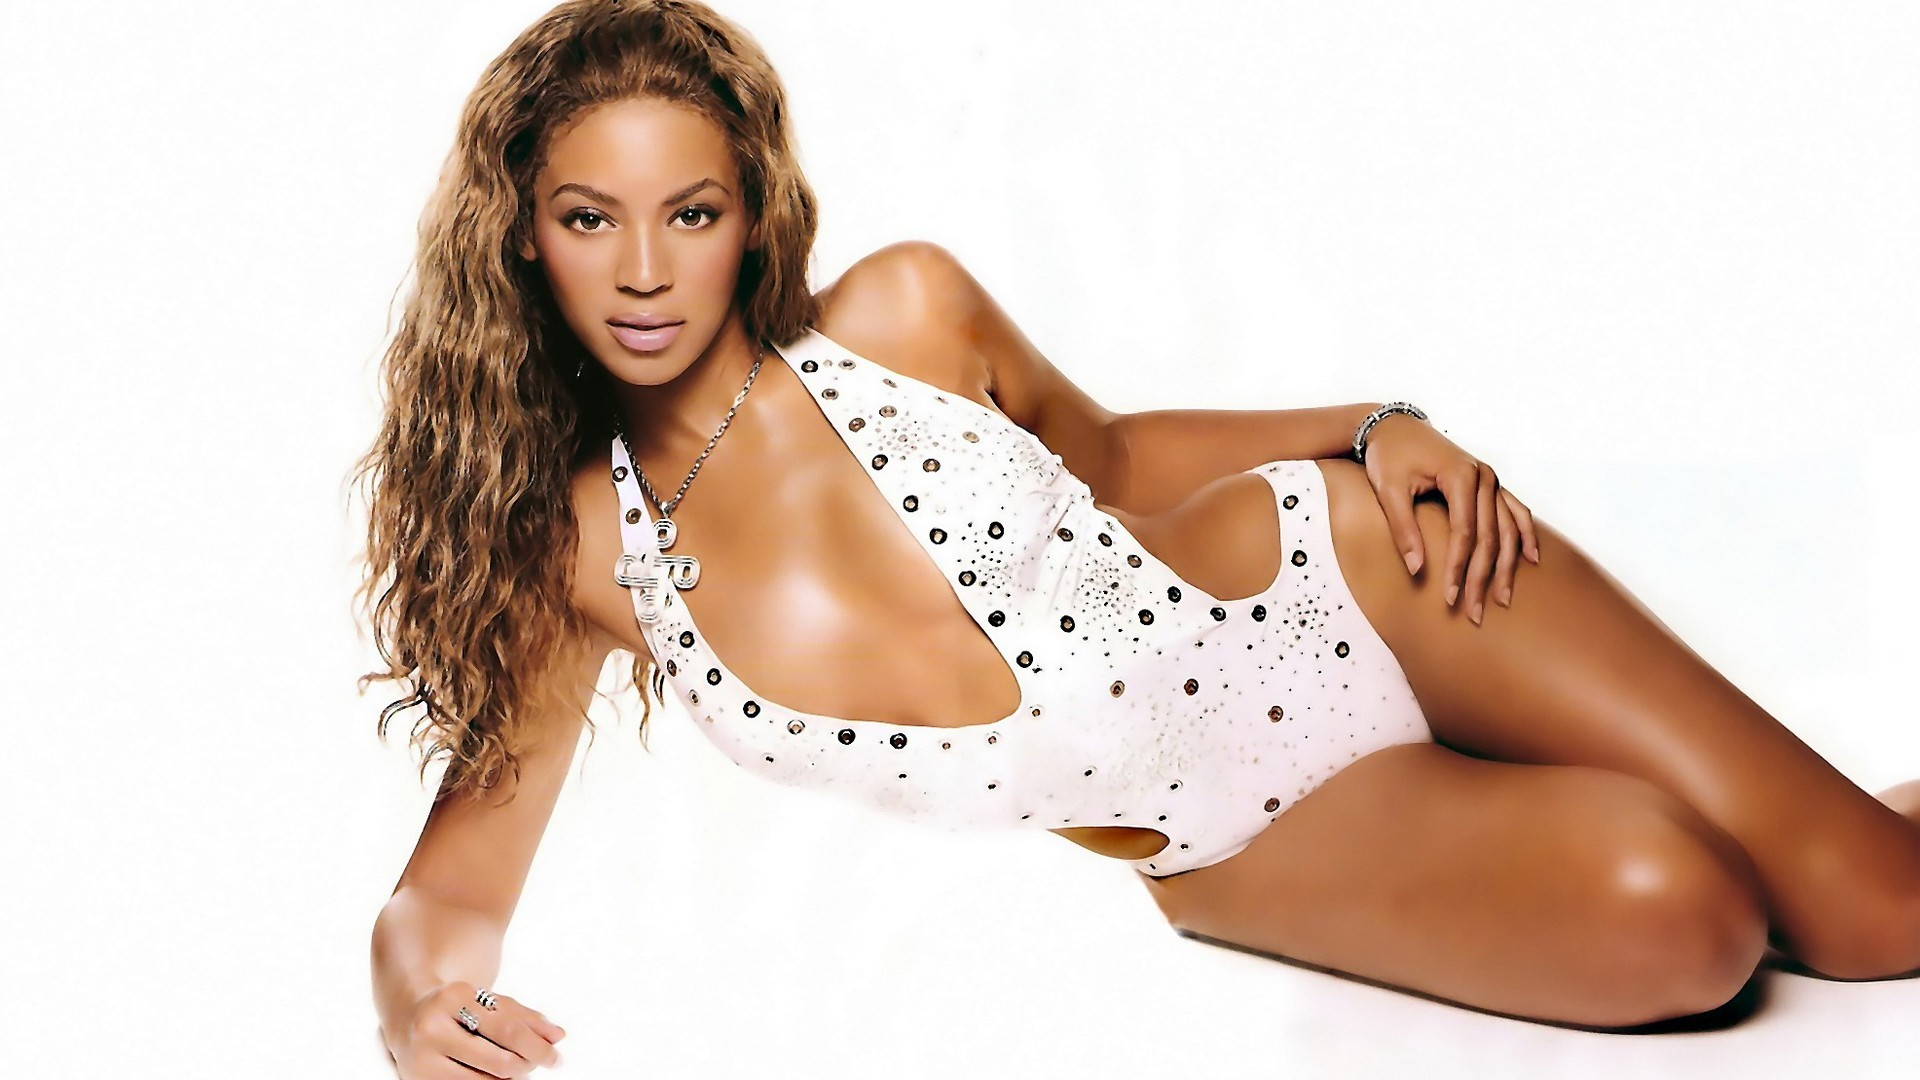 Hot beyonce Beyonce Bikini